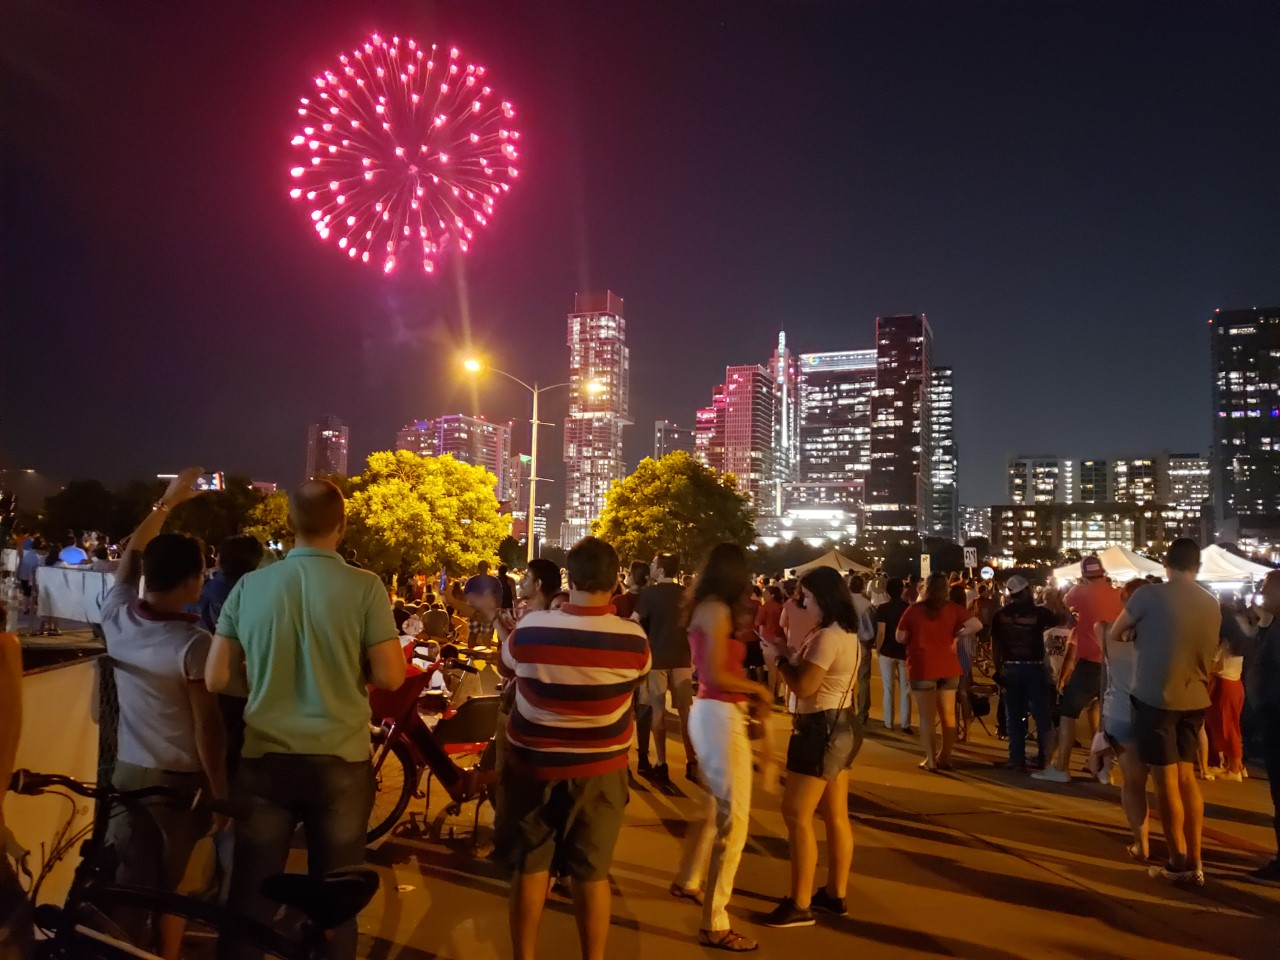 Austin 4th of July fireworks